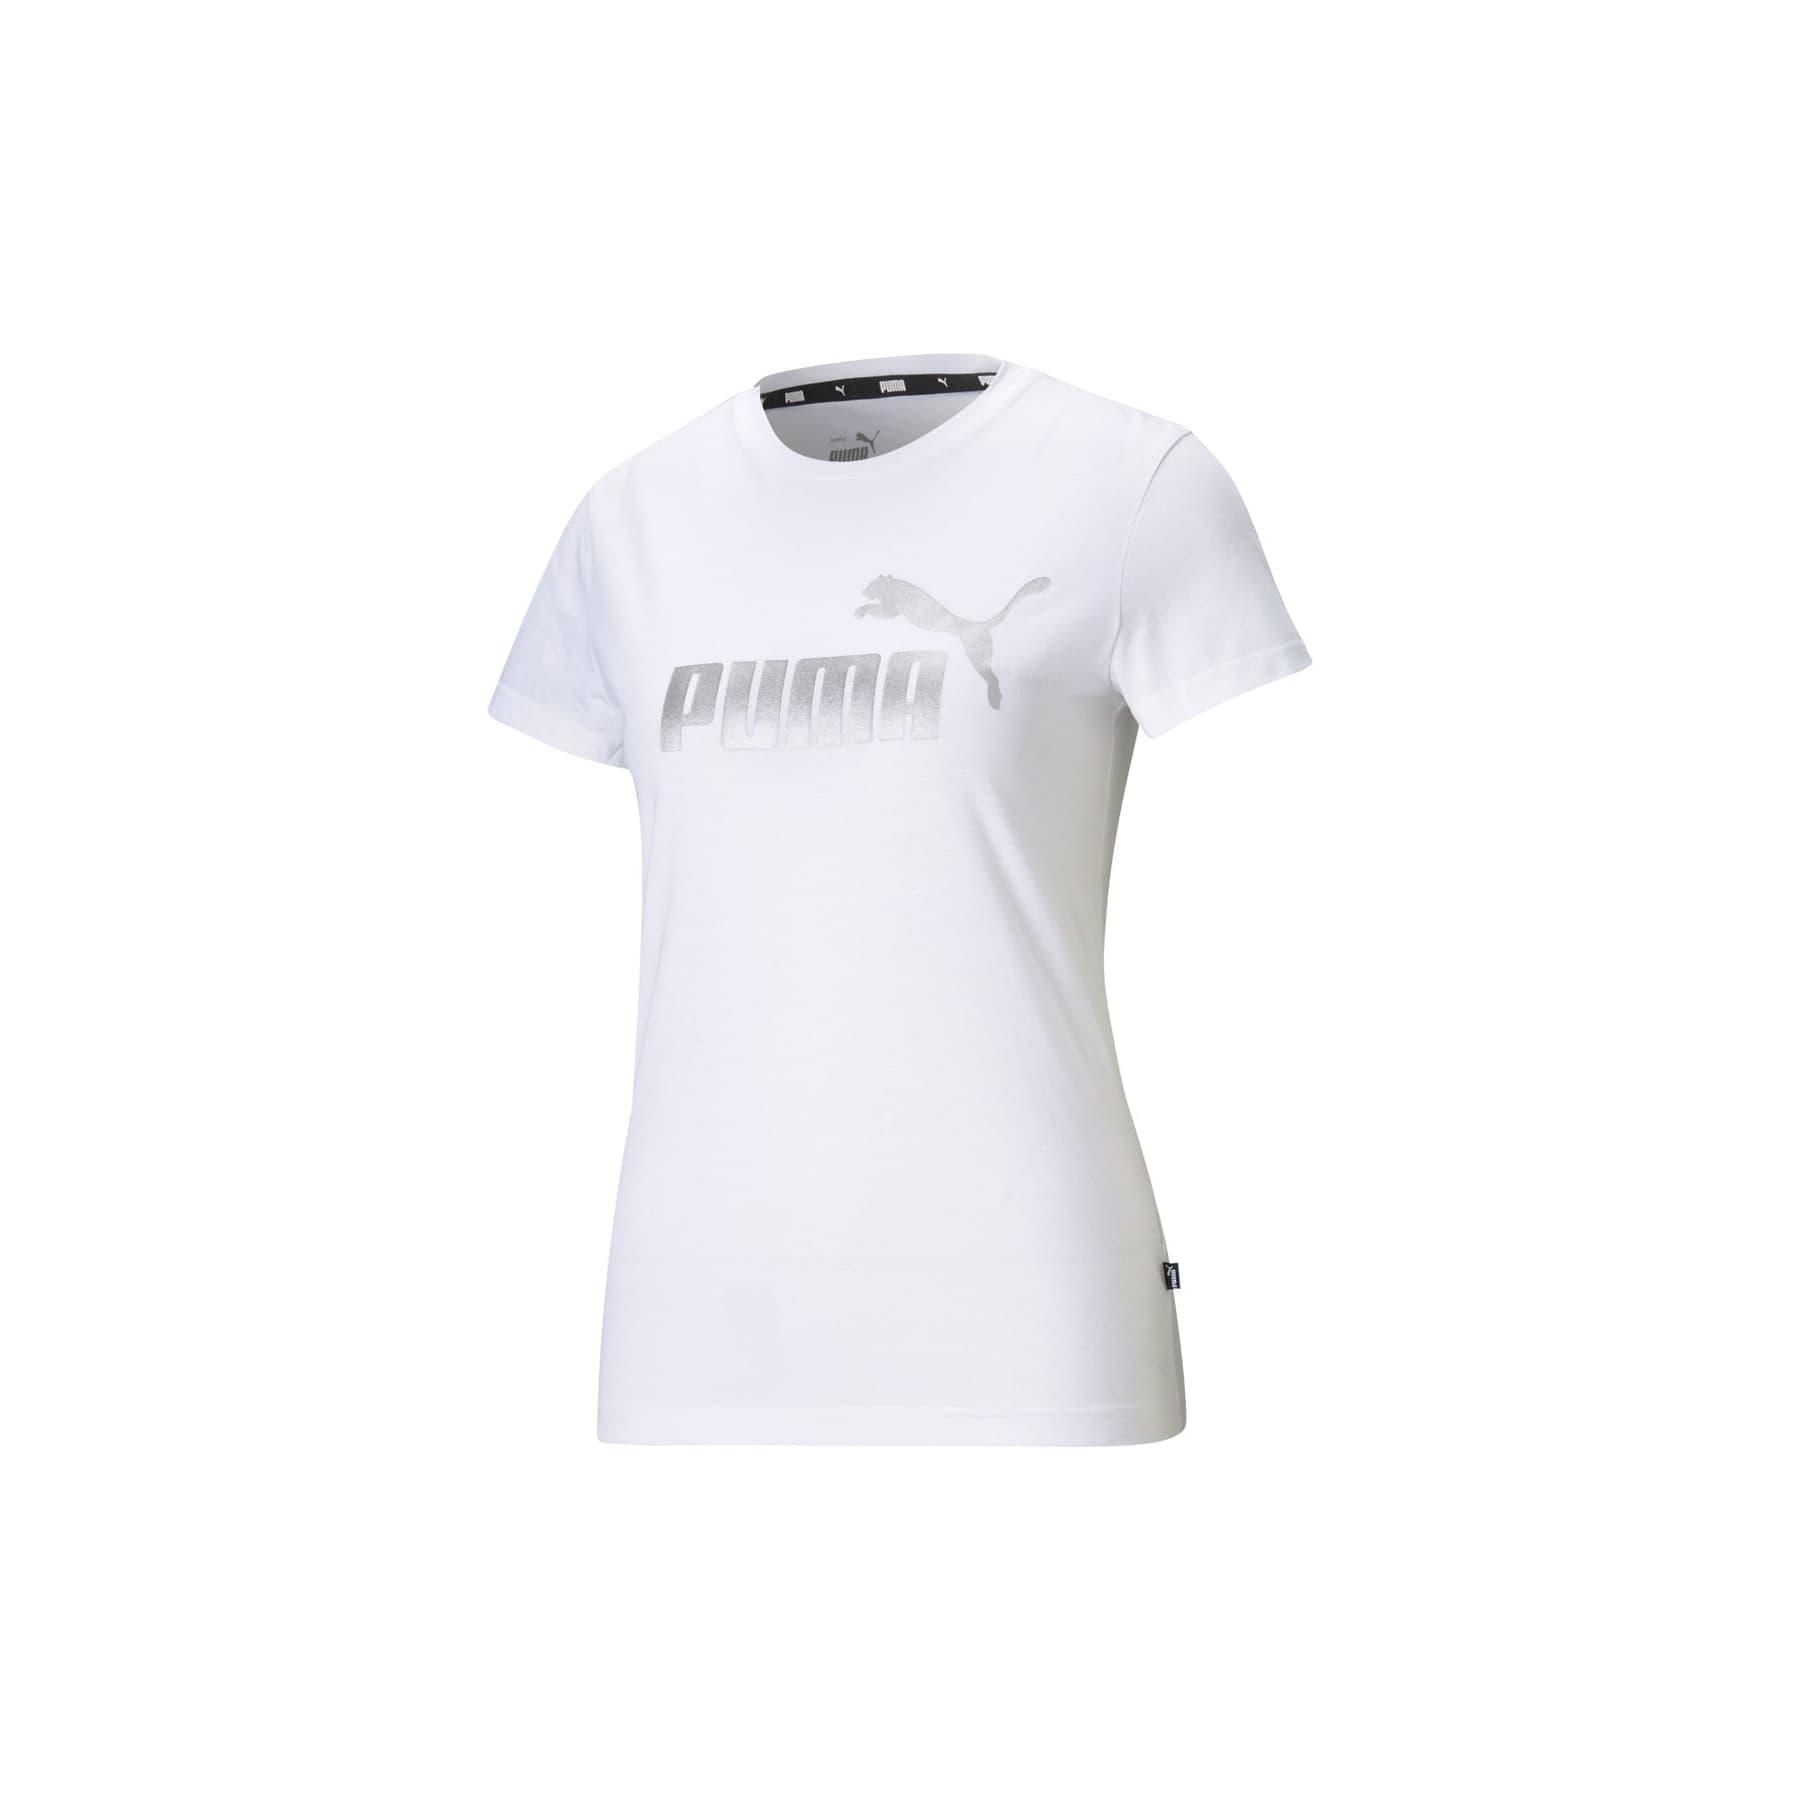 Essentials+ Metallic Kadın Beyaz Tişört (586890-02)